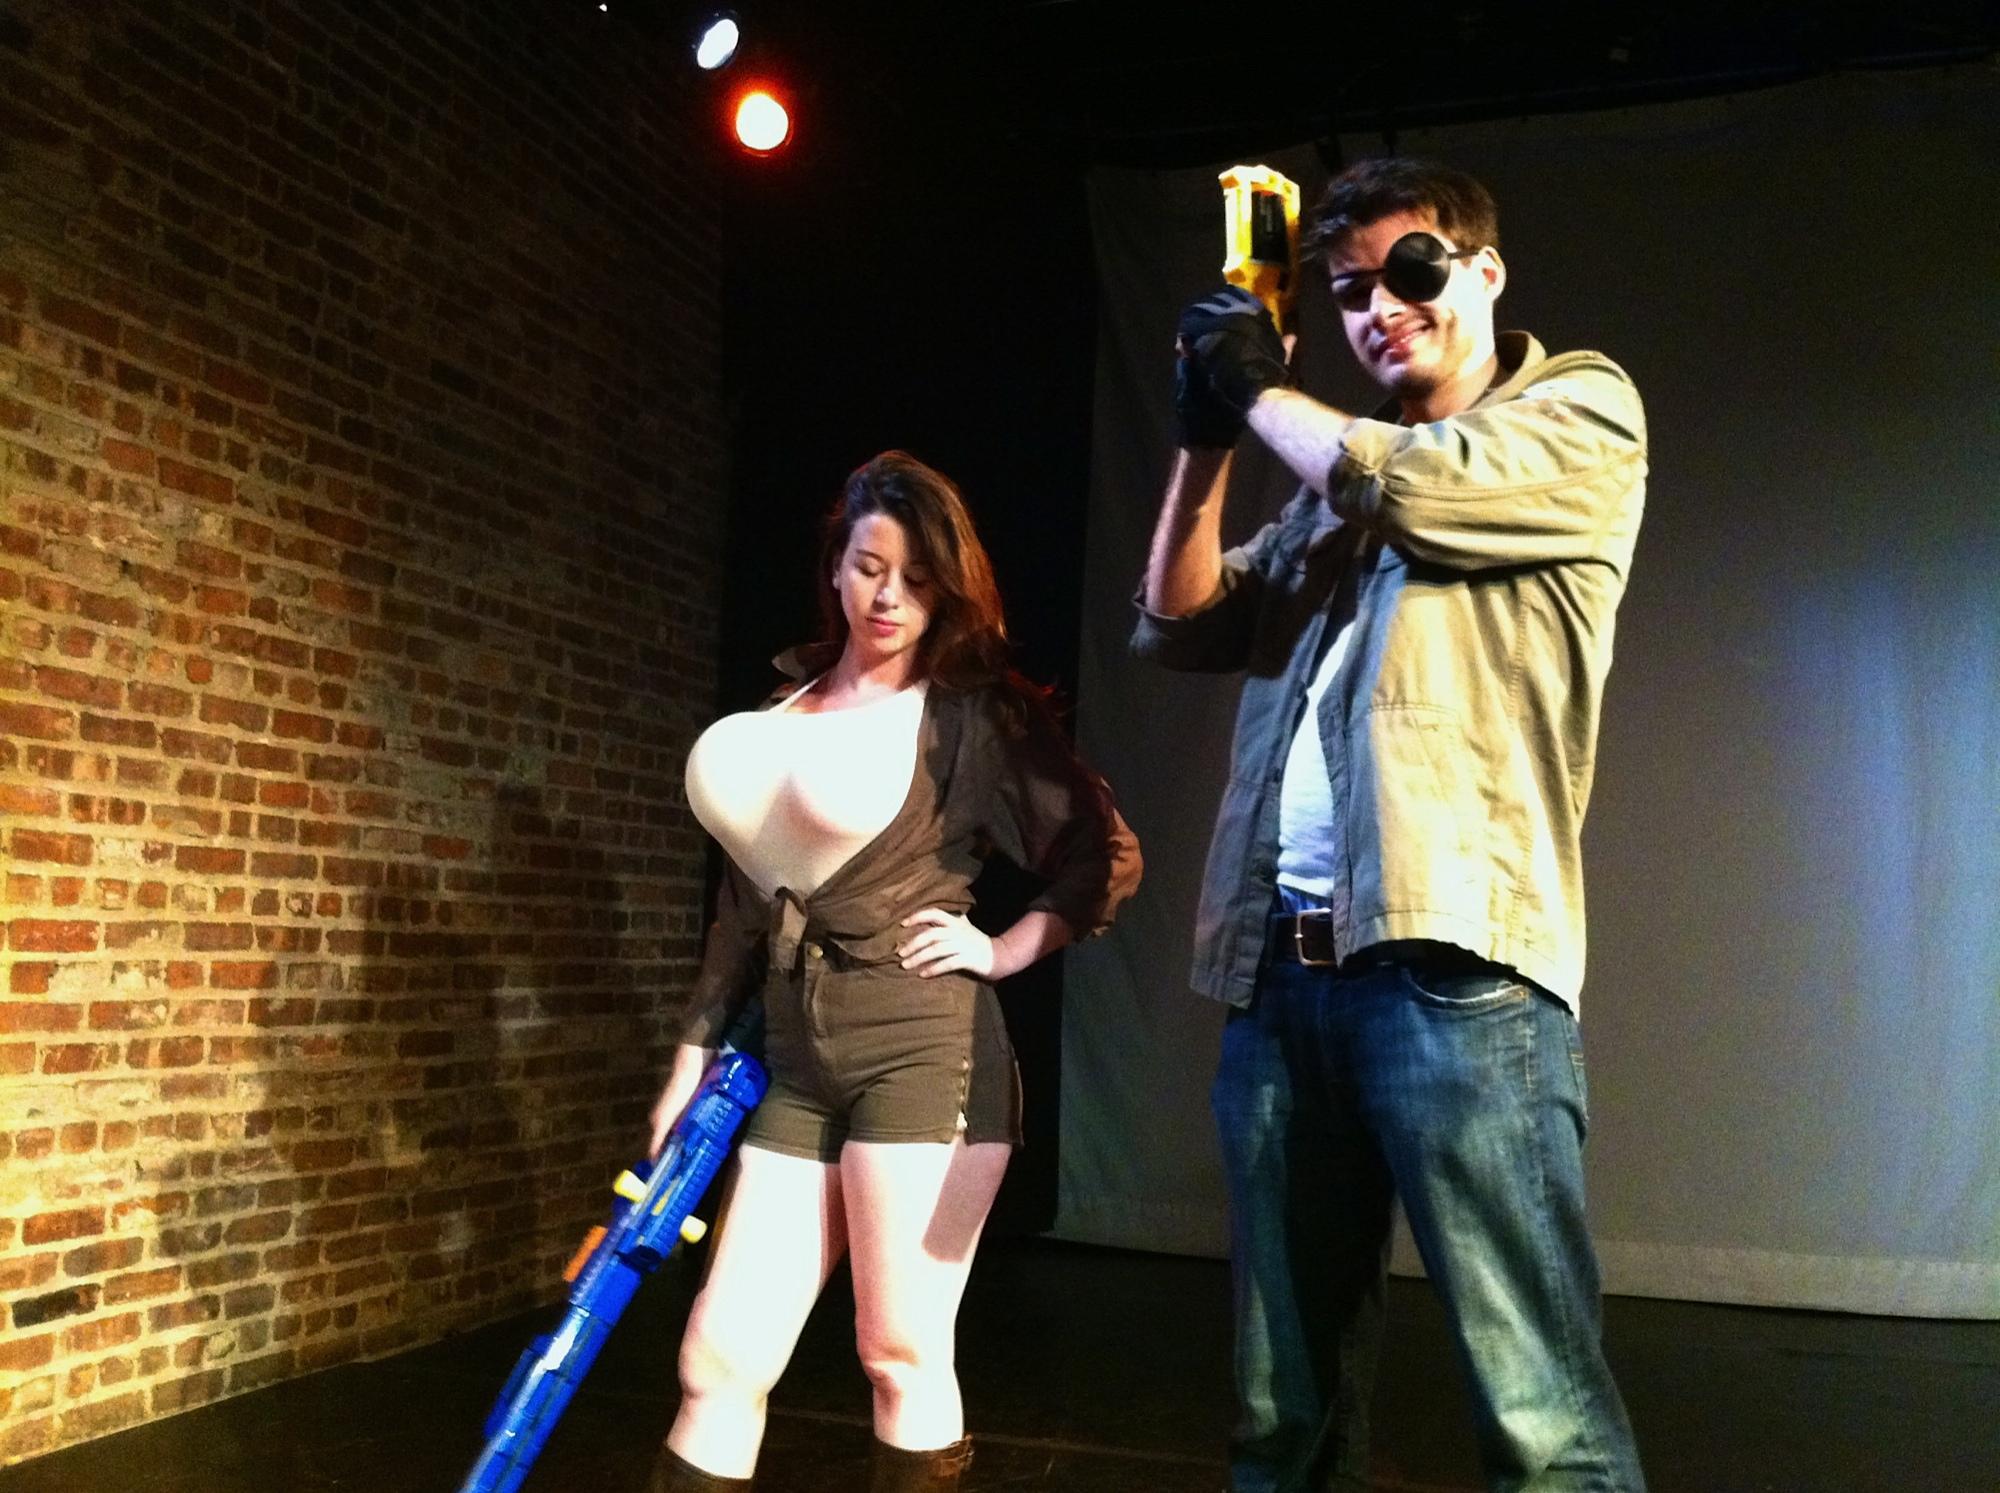 Svetlana (Ariel Gitlin) and Crazy George (Drew Murtaugh), ready for action.